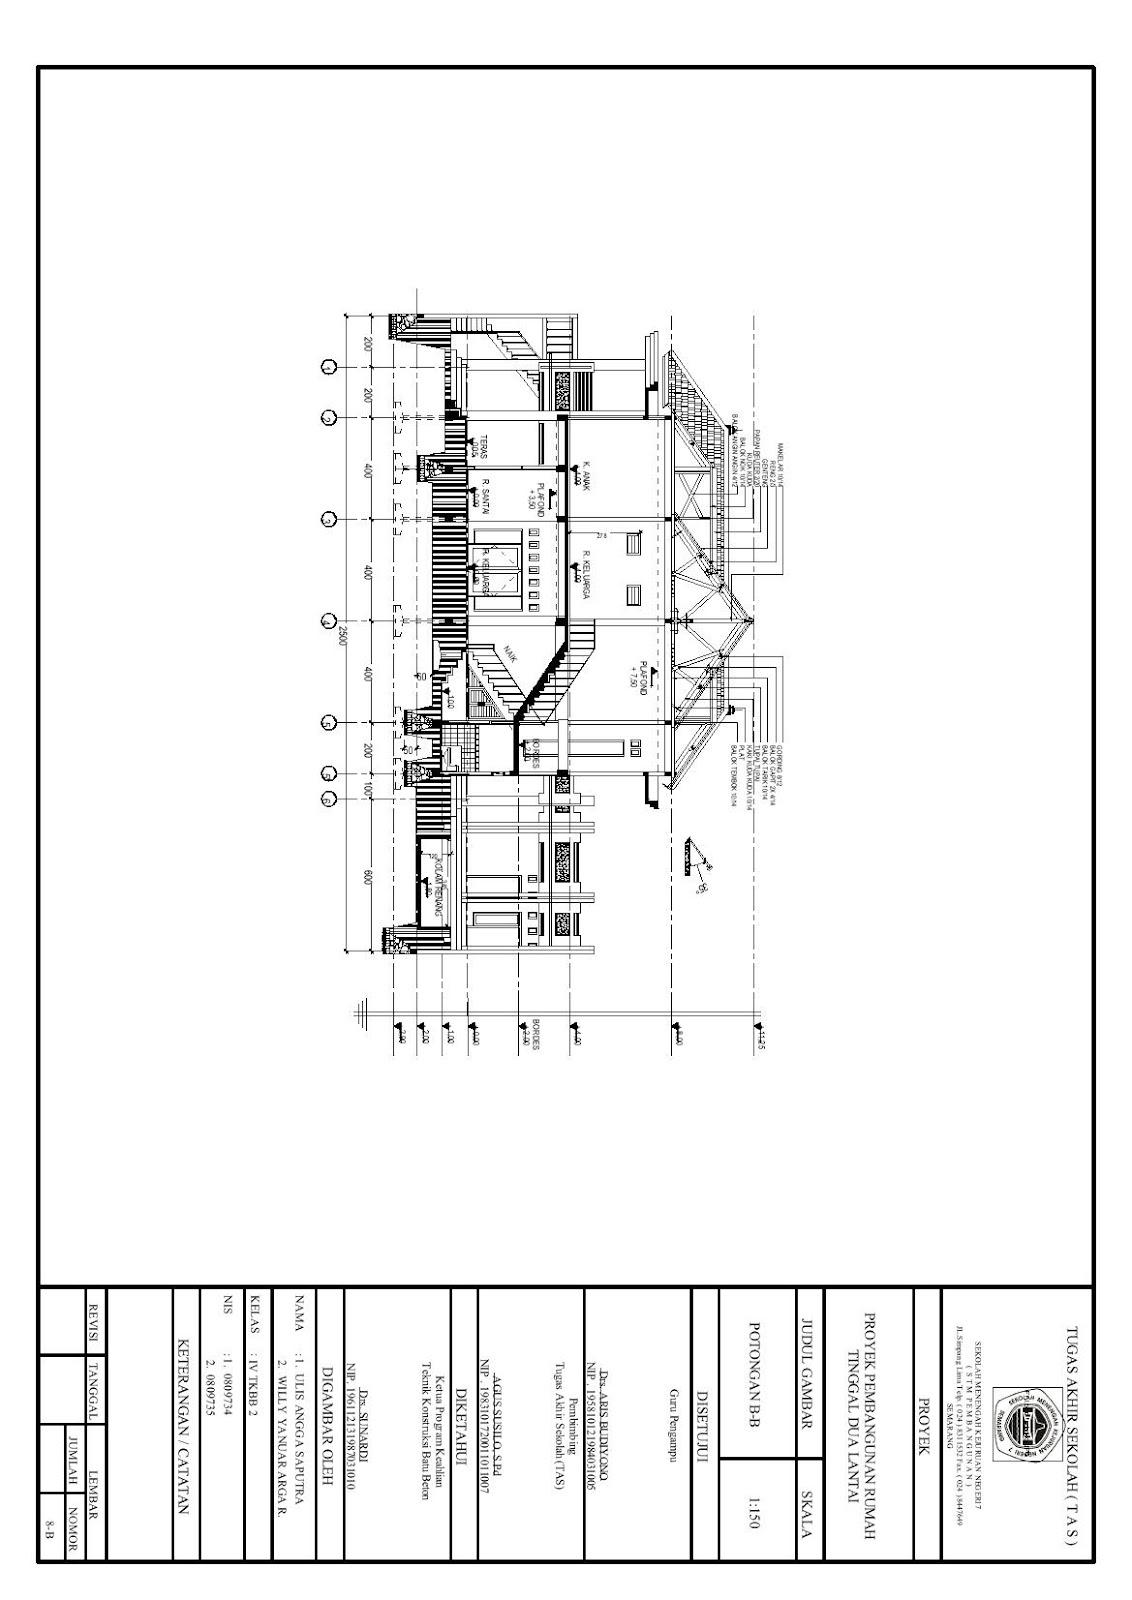 gambar rumah tinggal 2 lantai auto cad tugas akhir